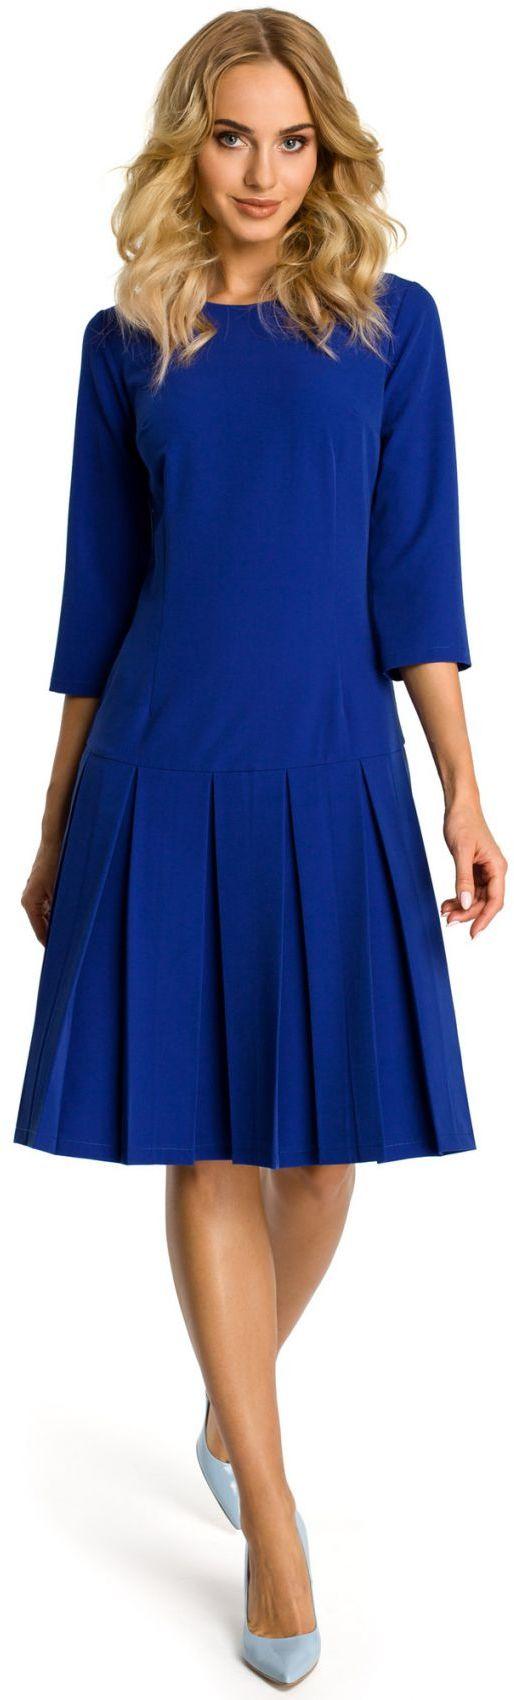 M336 sukienka chabrowa